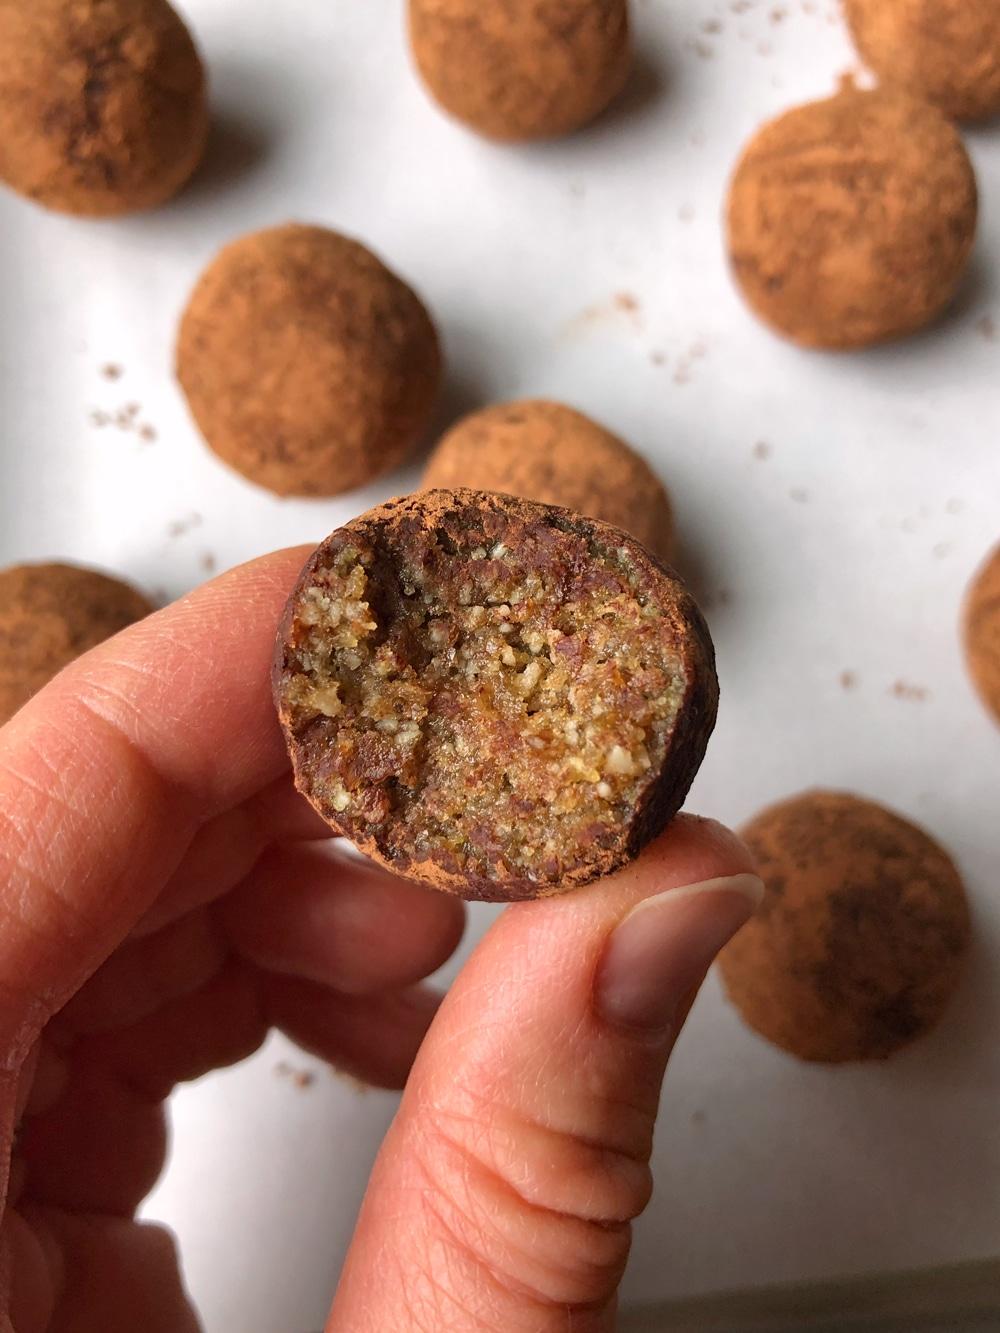 Nut-Free-Protein-Snack-Recipe